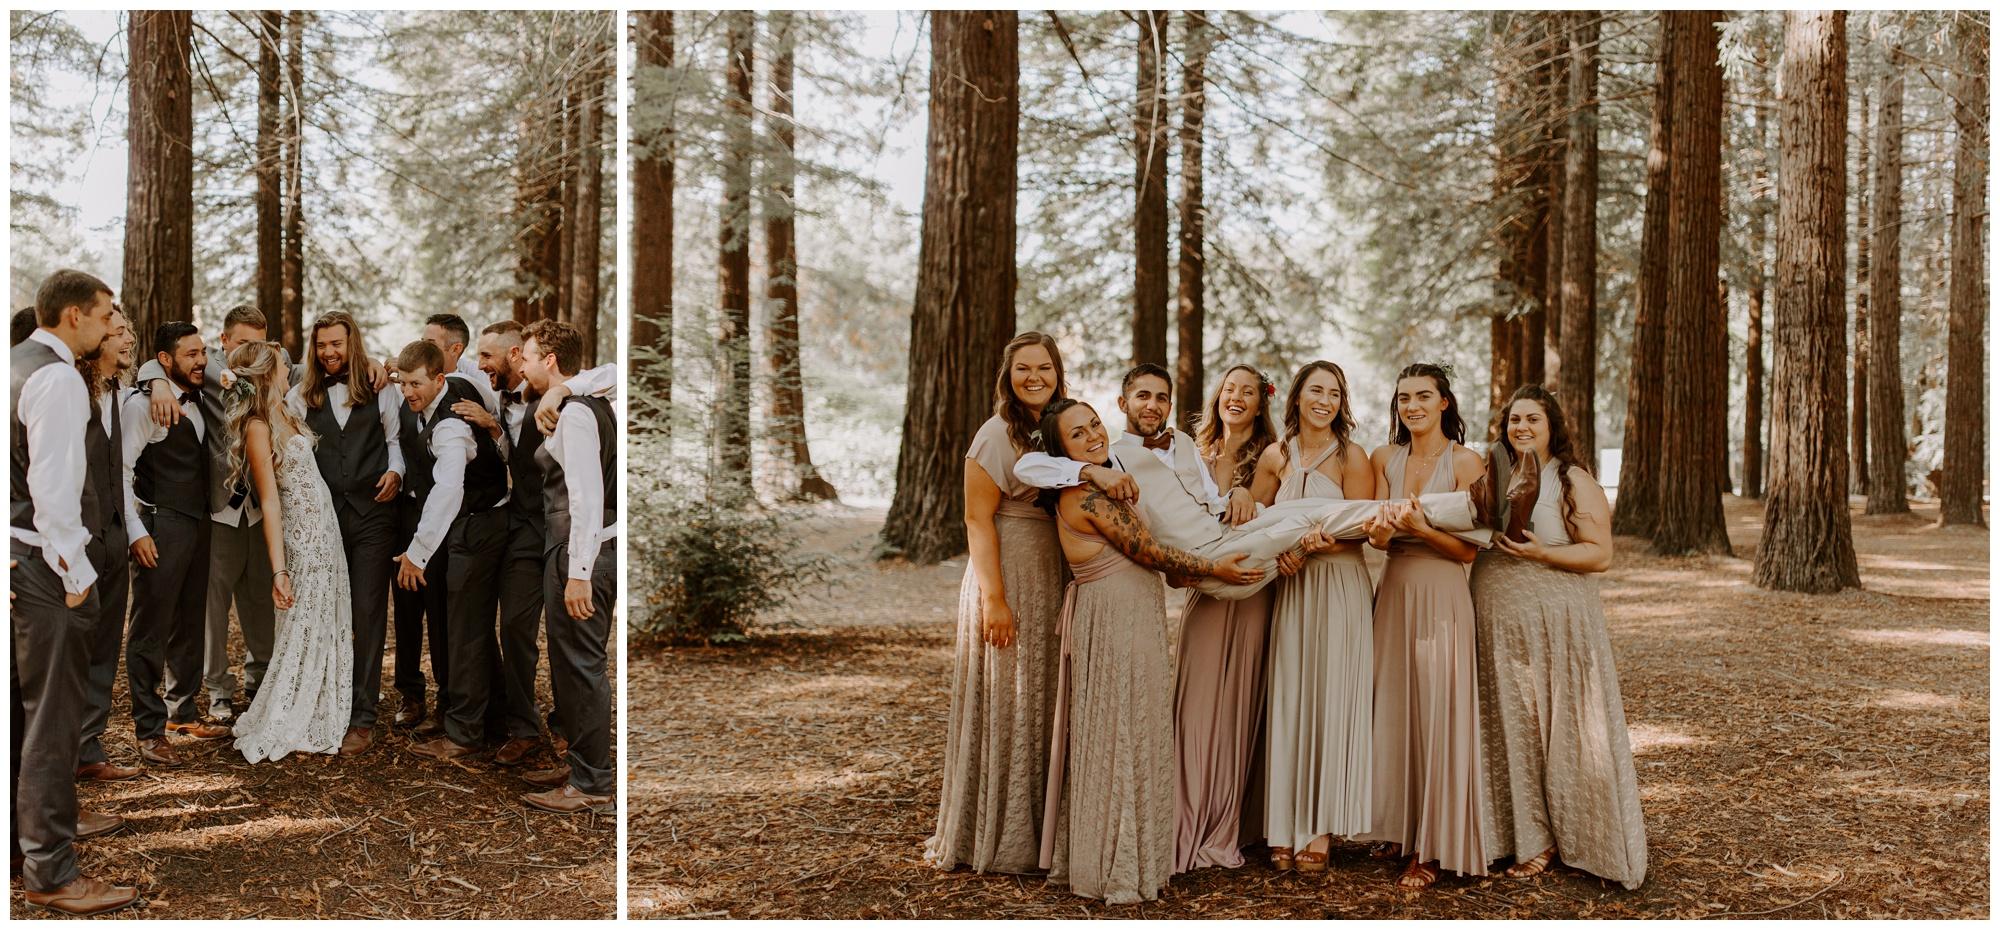 Redwood Festival Wedding Humbolt California - Jessica Heron Images_0021.jpg